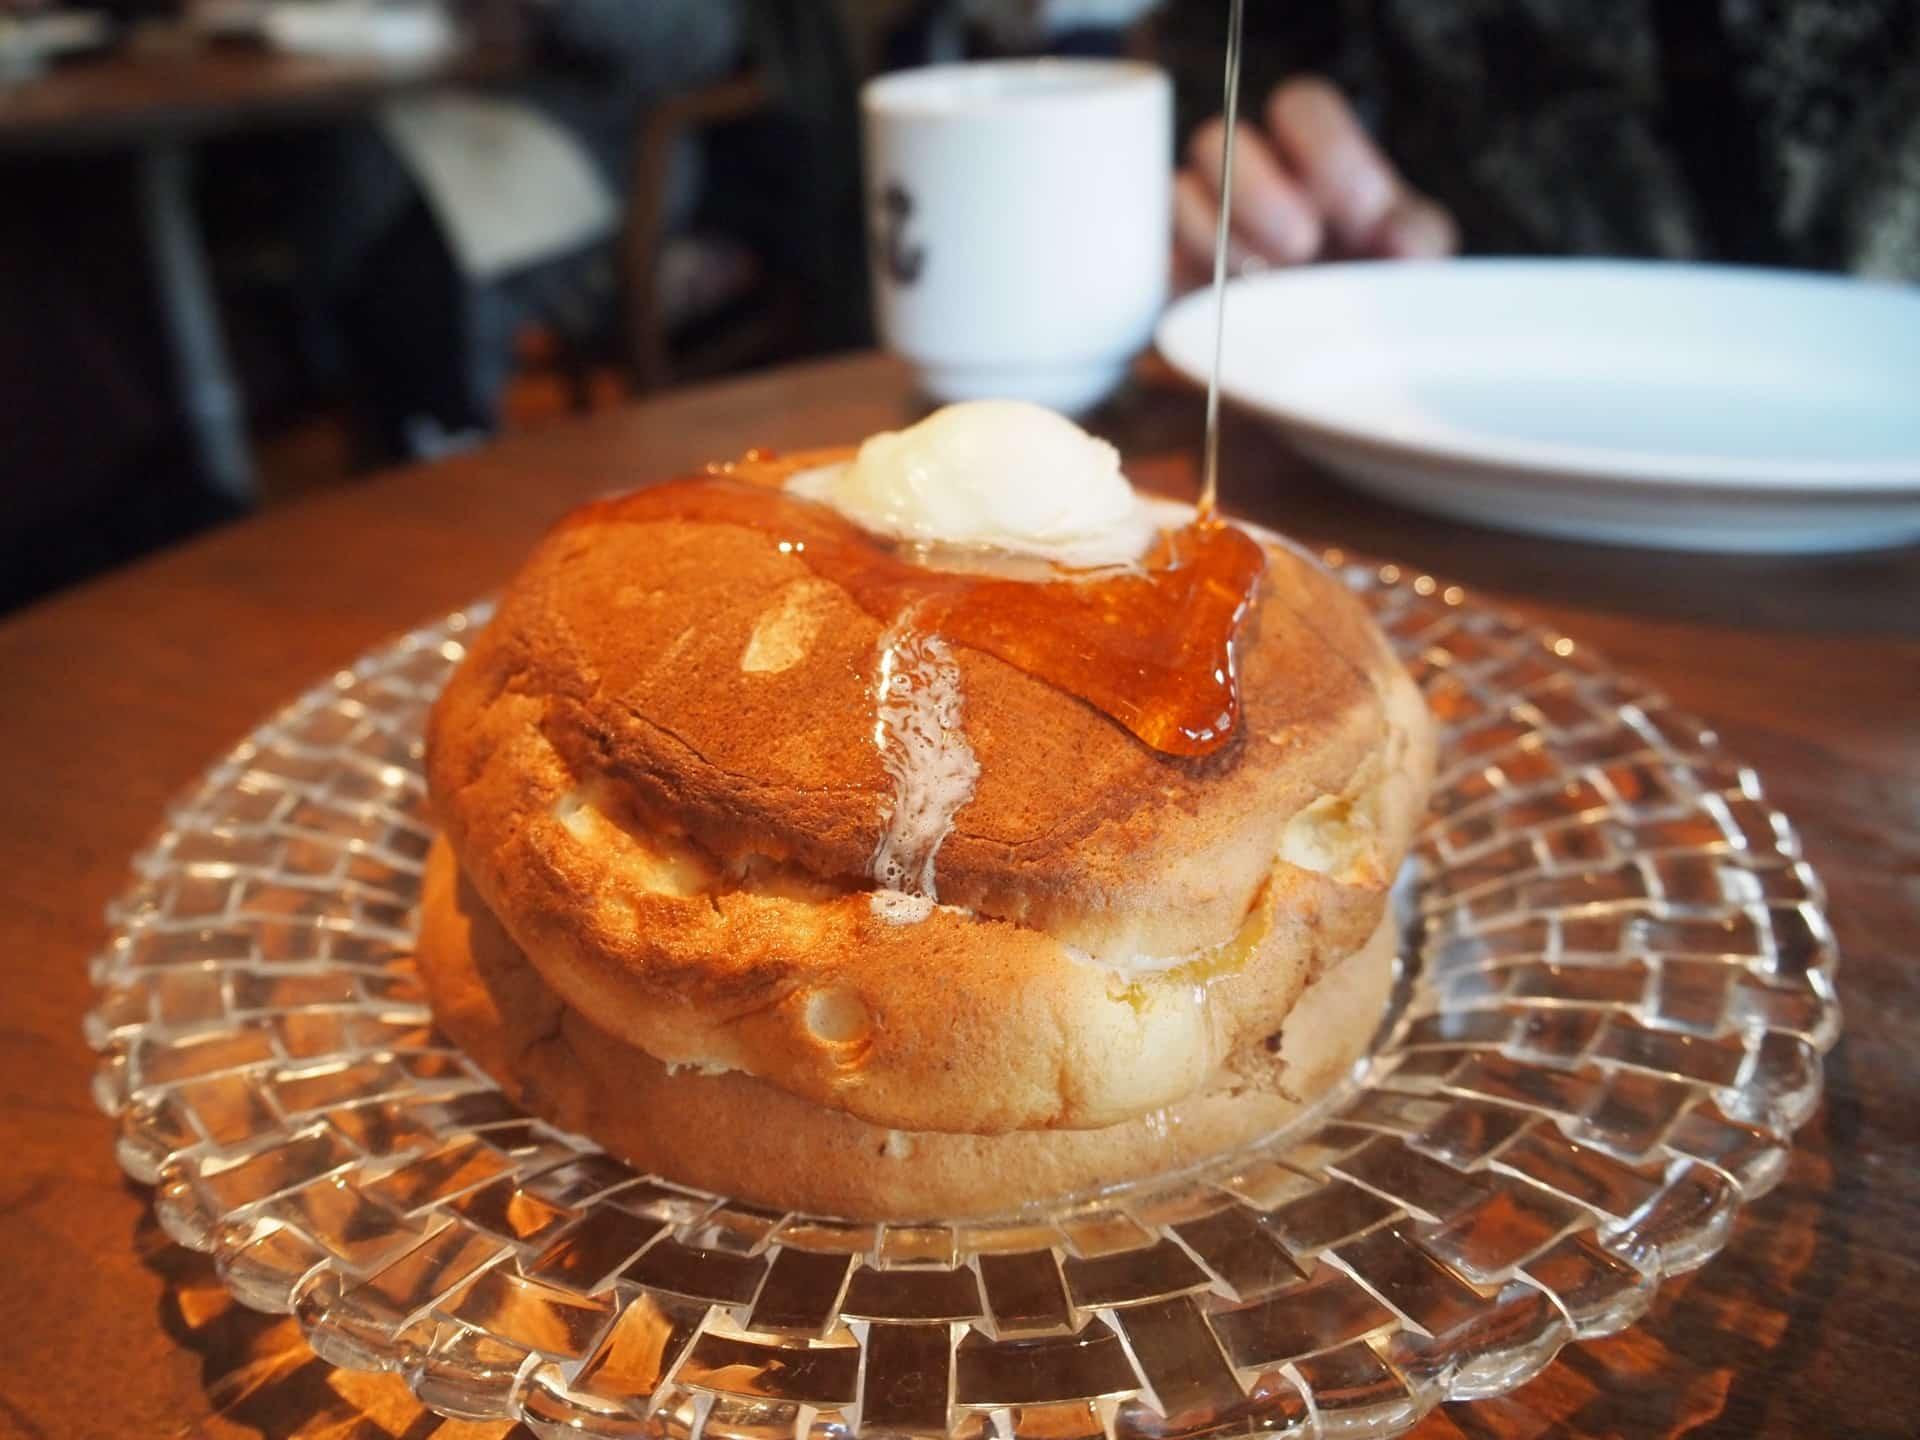 6th by ORIENTAL HOTEL − パンケーキが絶品…!ランチもリーズナブル